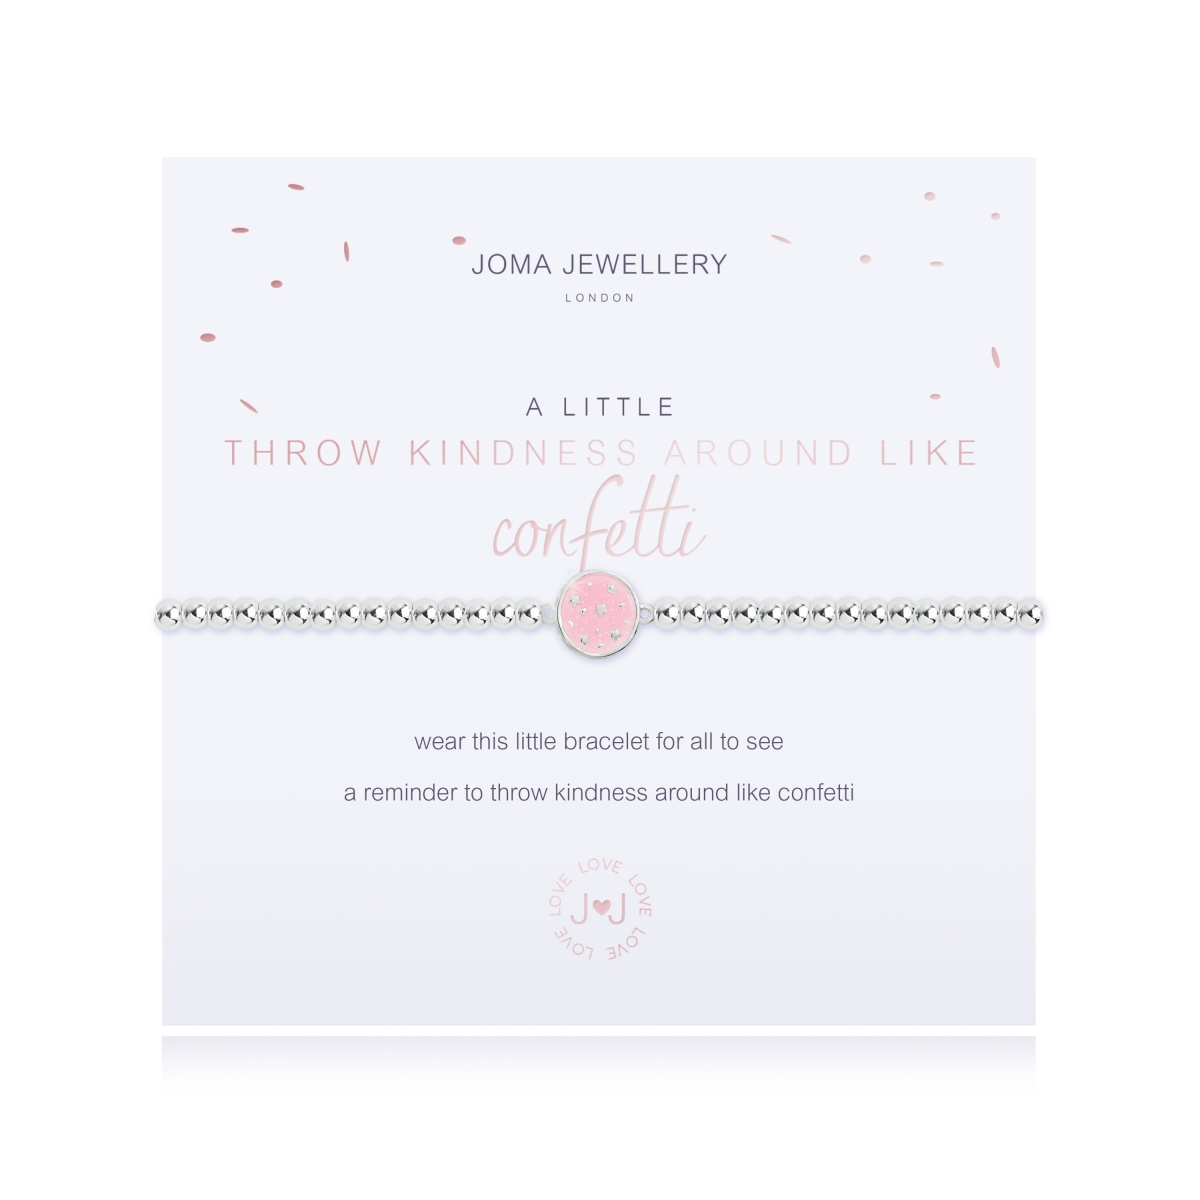 Joma Jewellery A Little 'Throw Kindness Around Like Confetti'